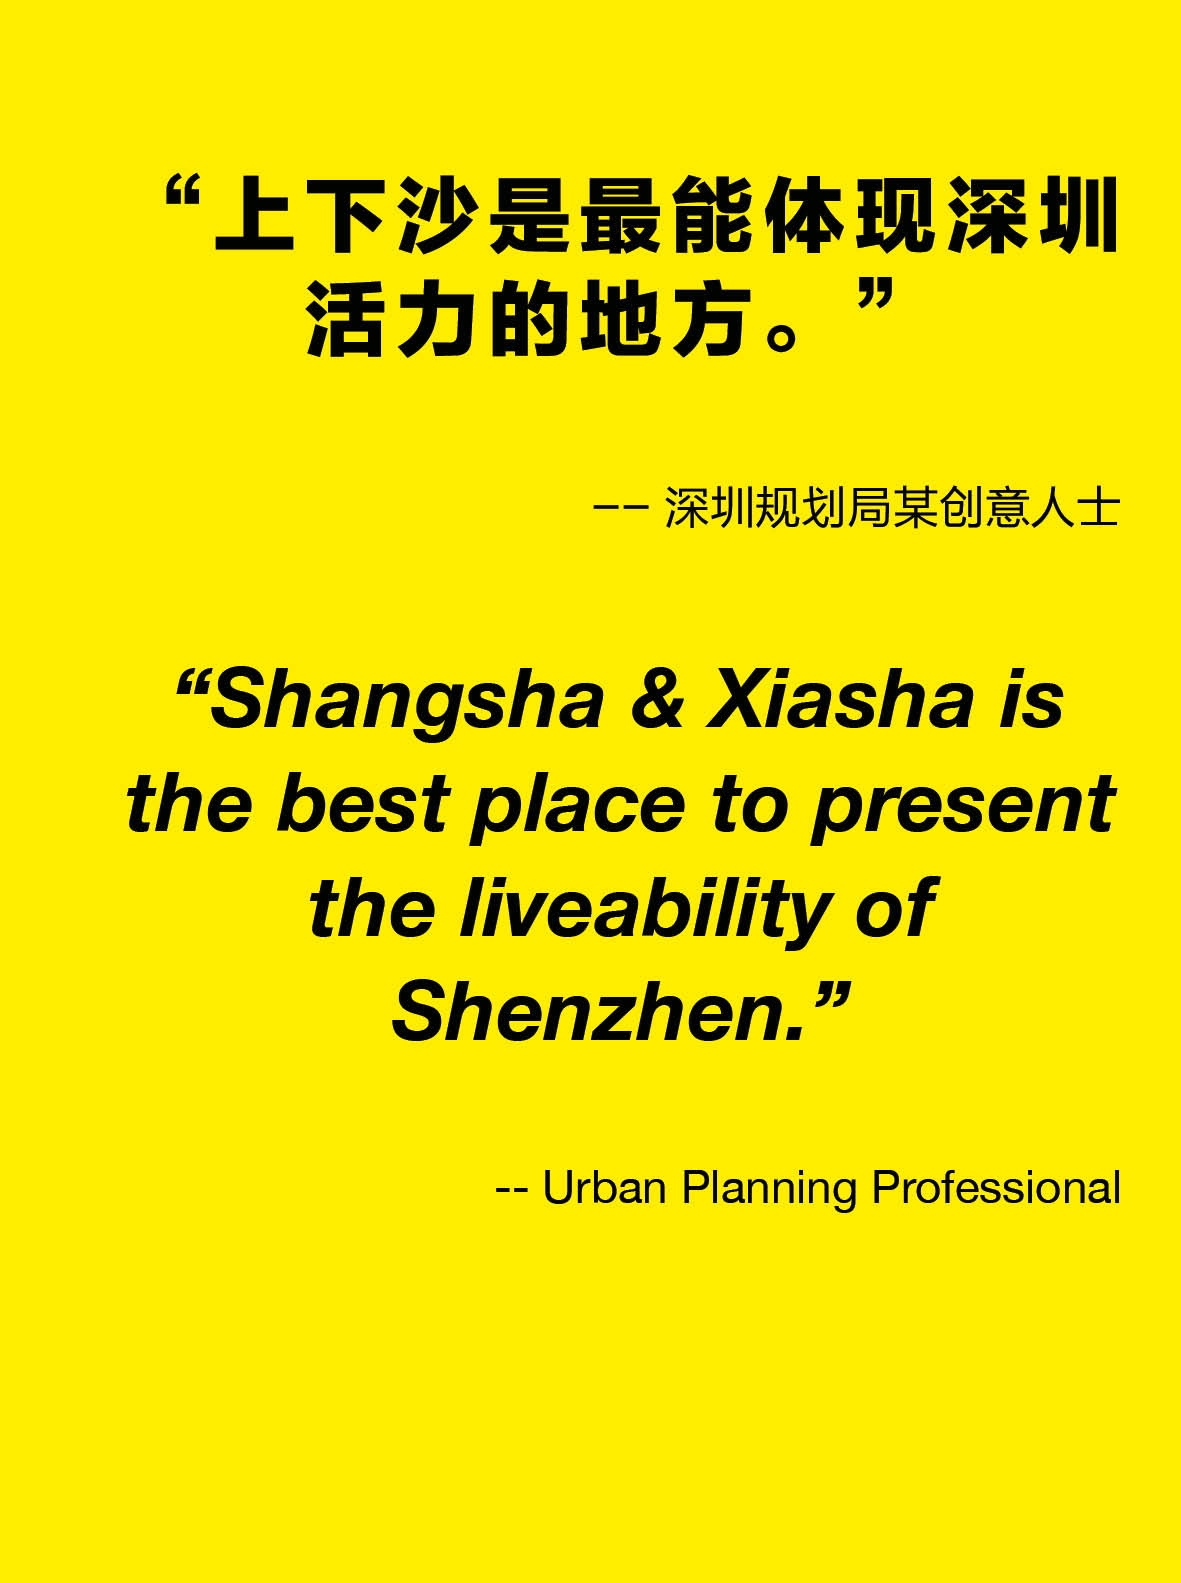 20180106_Shangsha Quotes test035.jpg